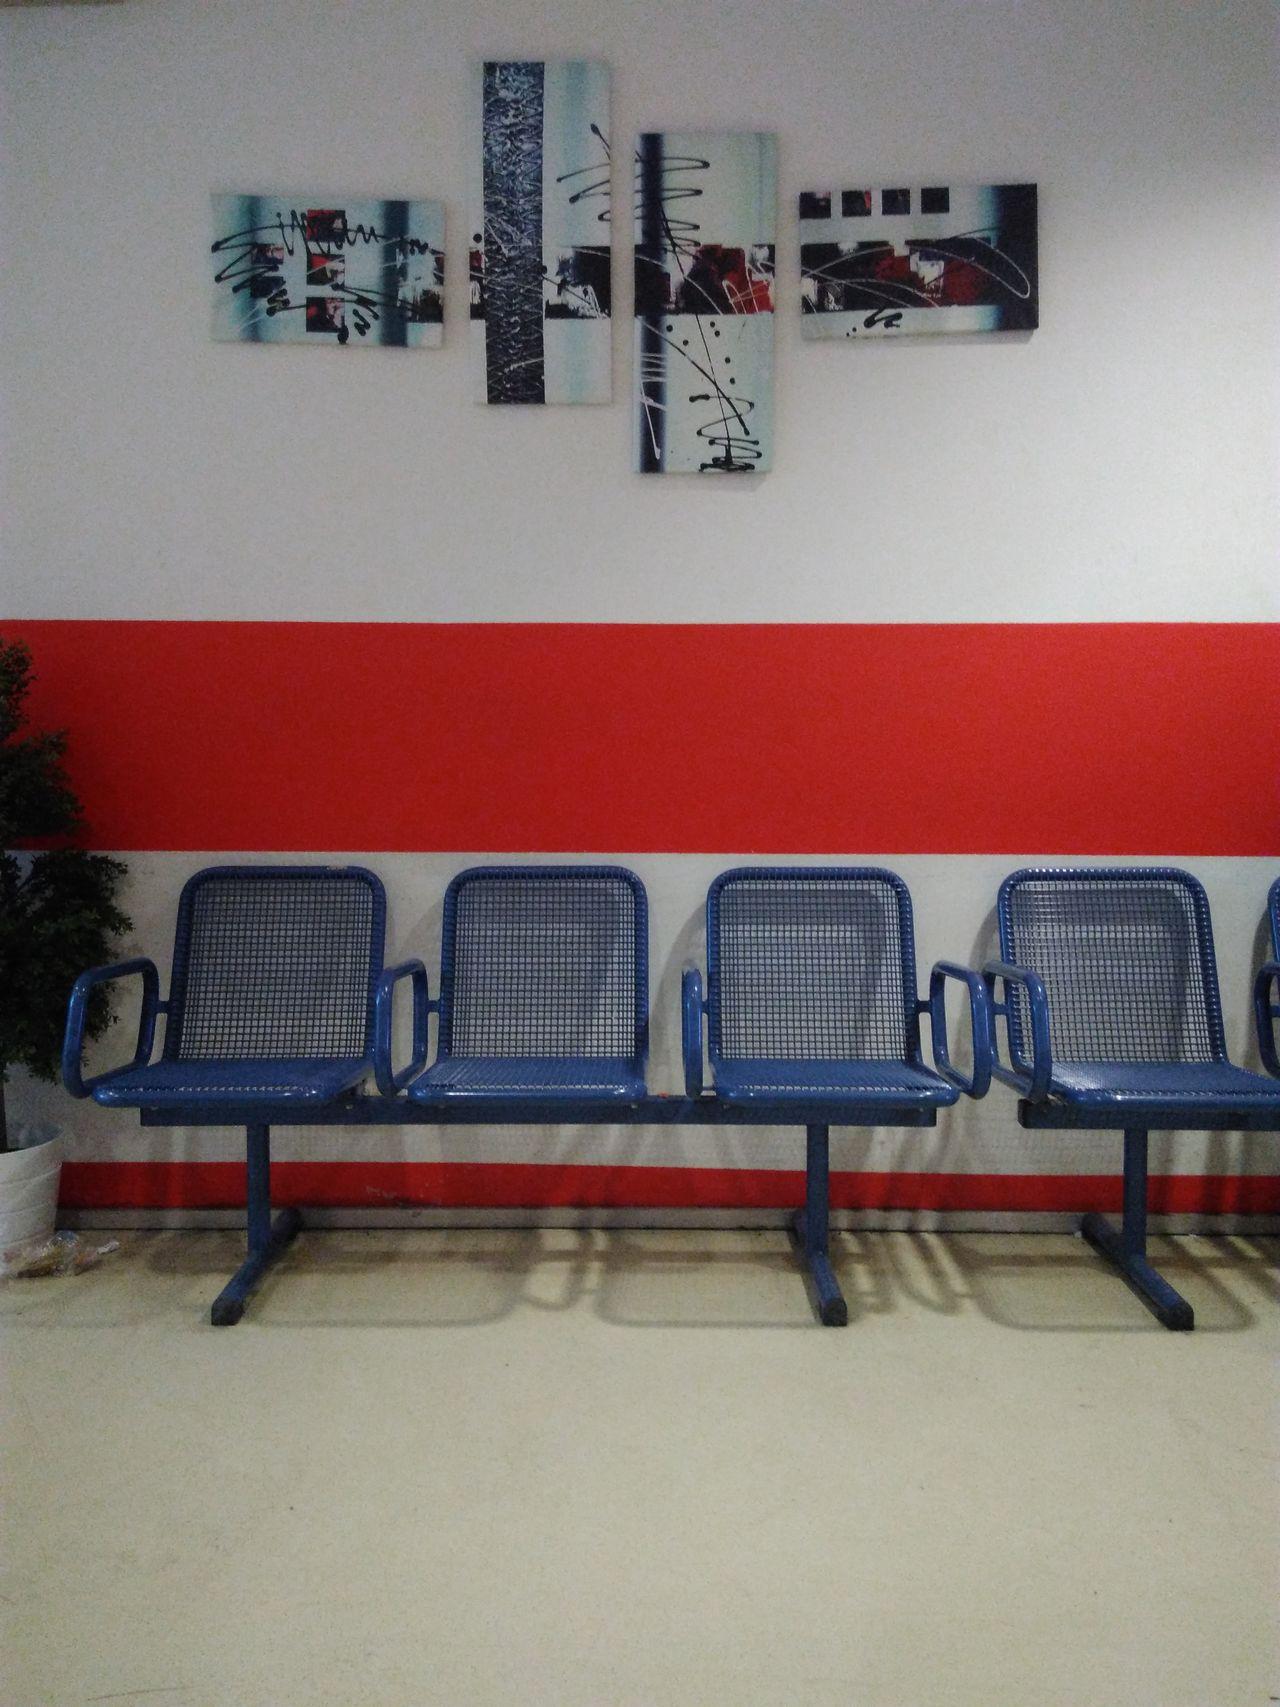 Warten Waiting Sitze Seats Bilder Pictures Blue Blau Wien Vienna Erdberg Zob  Wartehalle Indoors  No People Chair